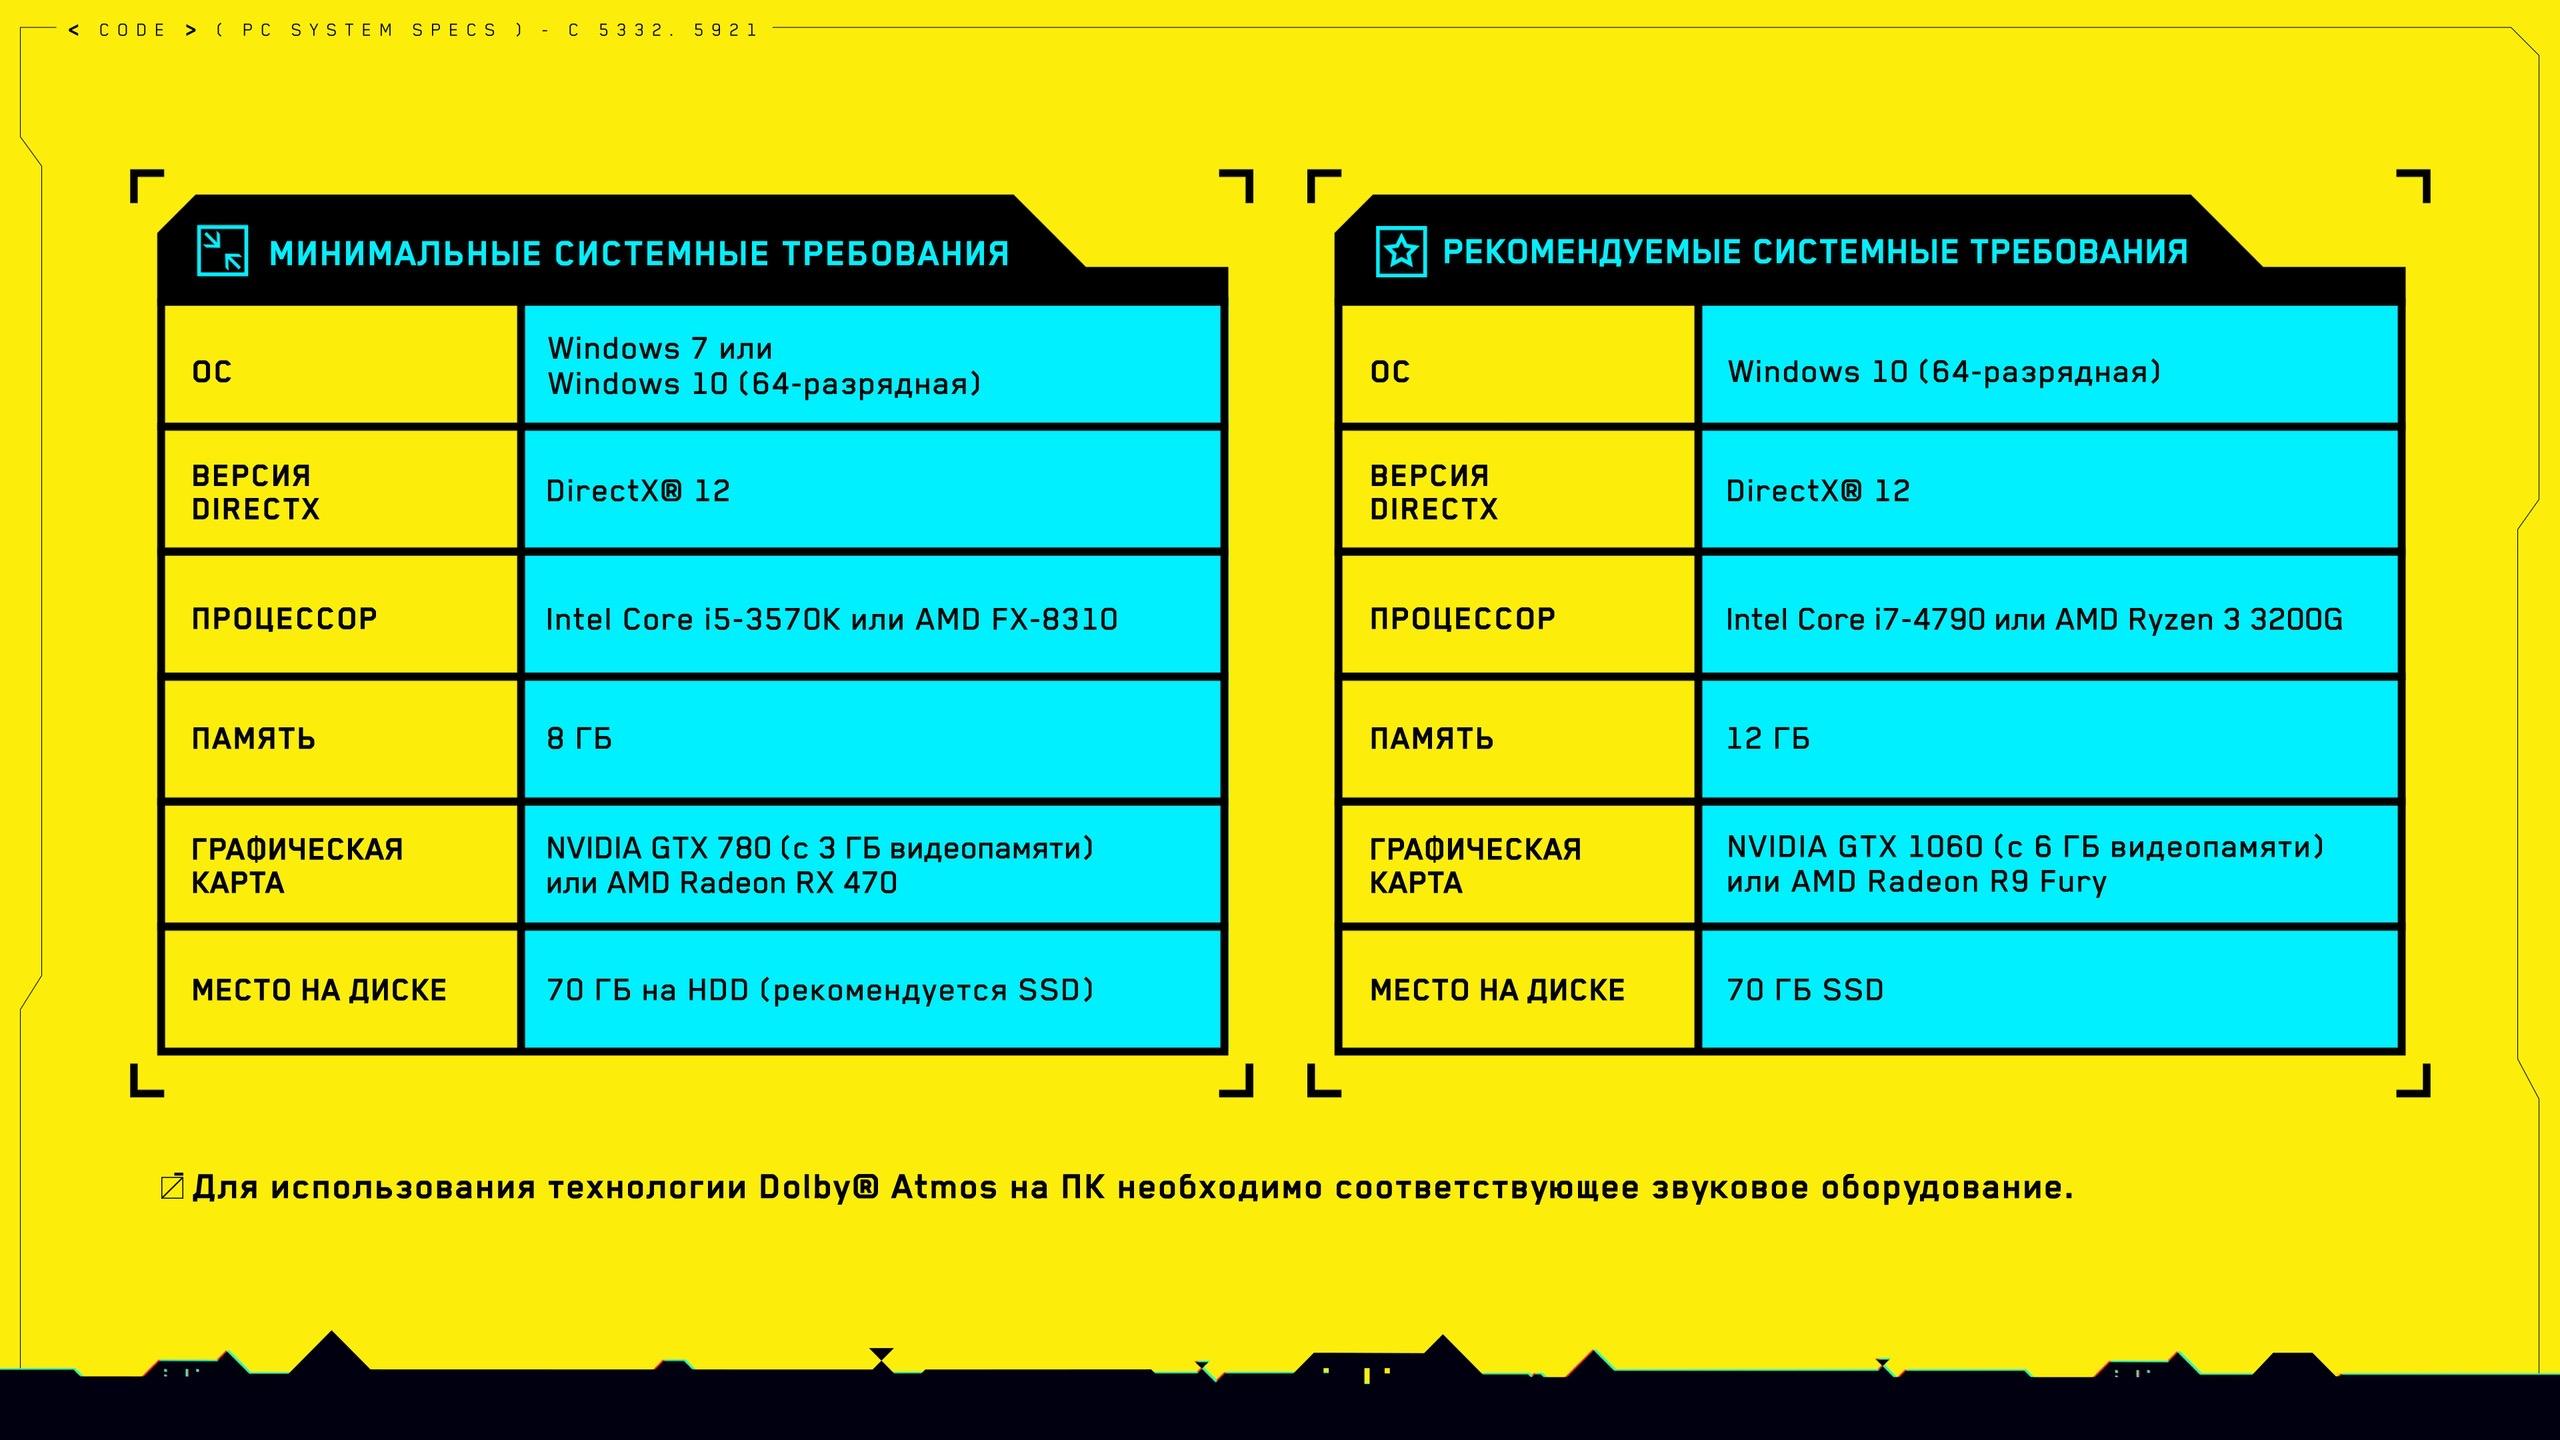 E723FB5A-C5AE-4A8B-8FE7-76D73F3E751A.jpeg